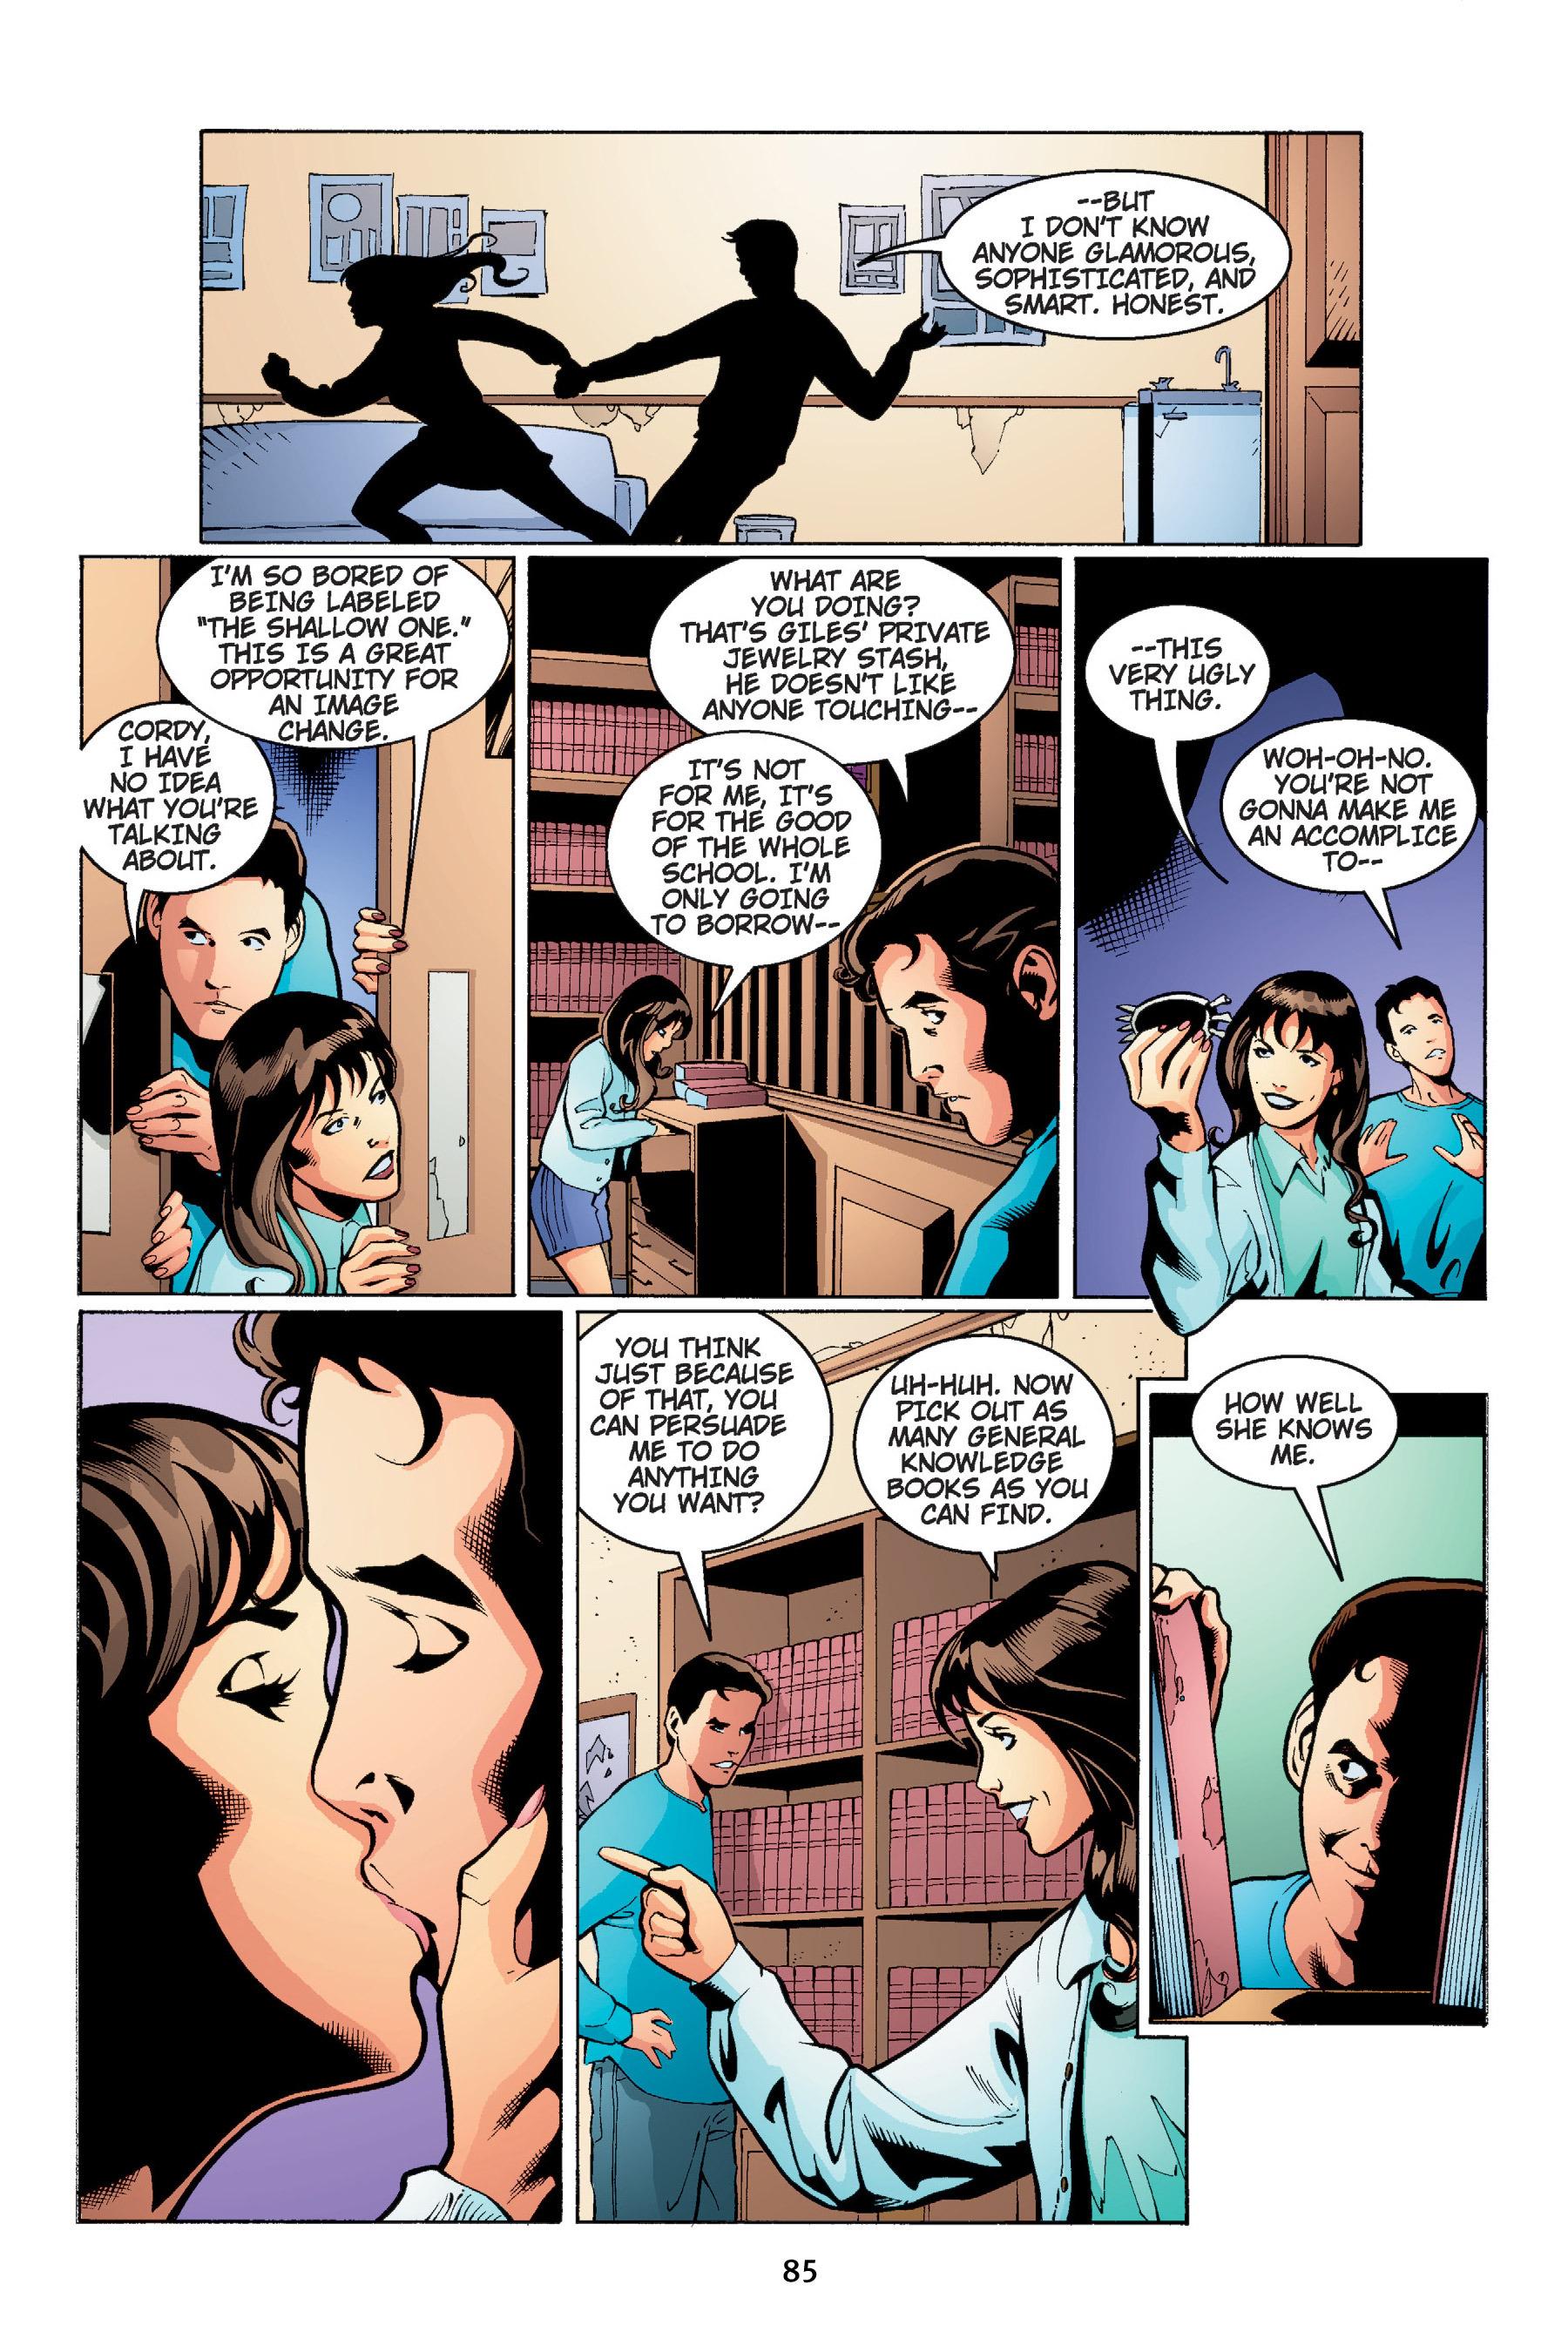 Read online Buffy the Vampire Slayer: Omnibus comic -  Issue # TPB 4 - 86